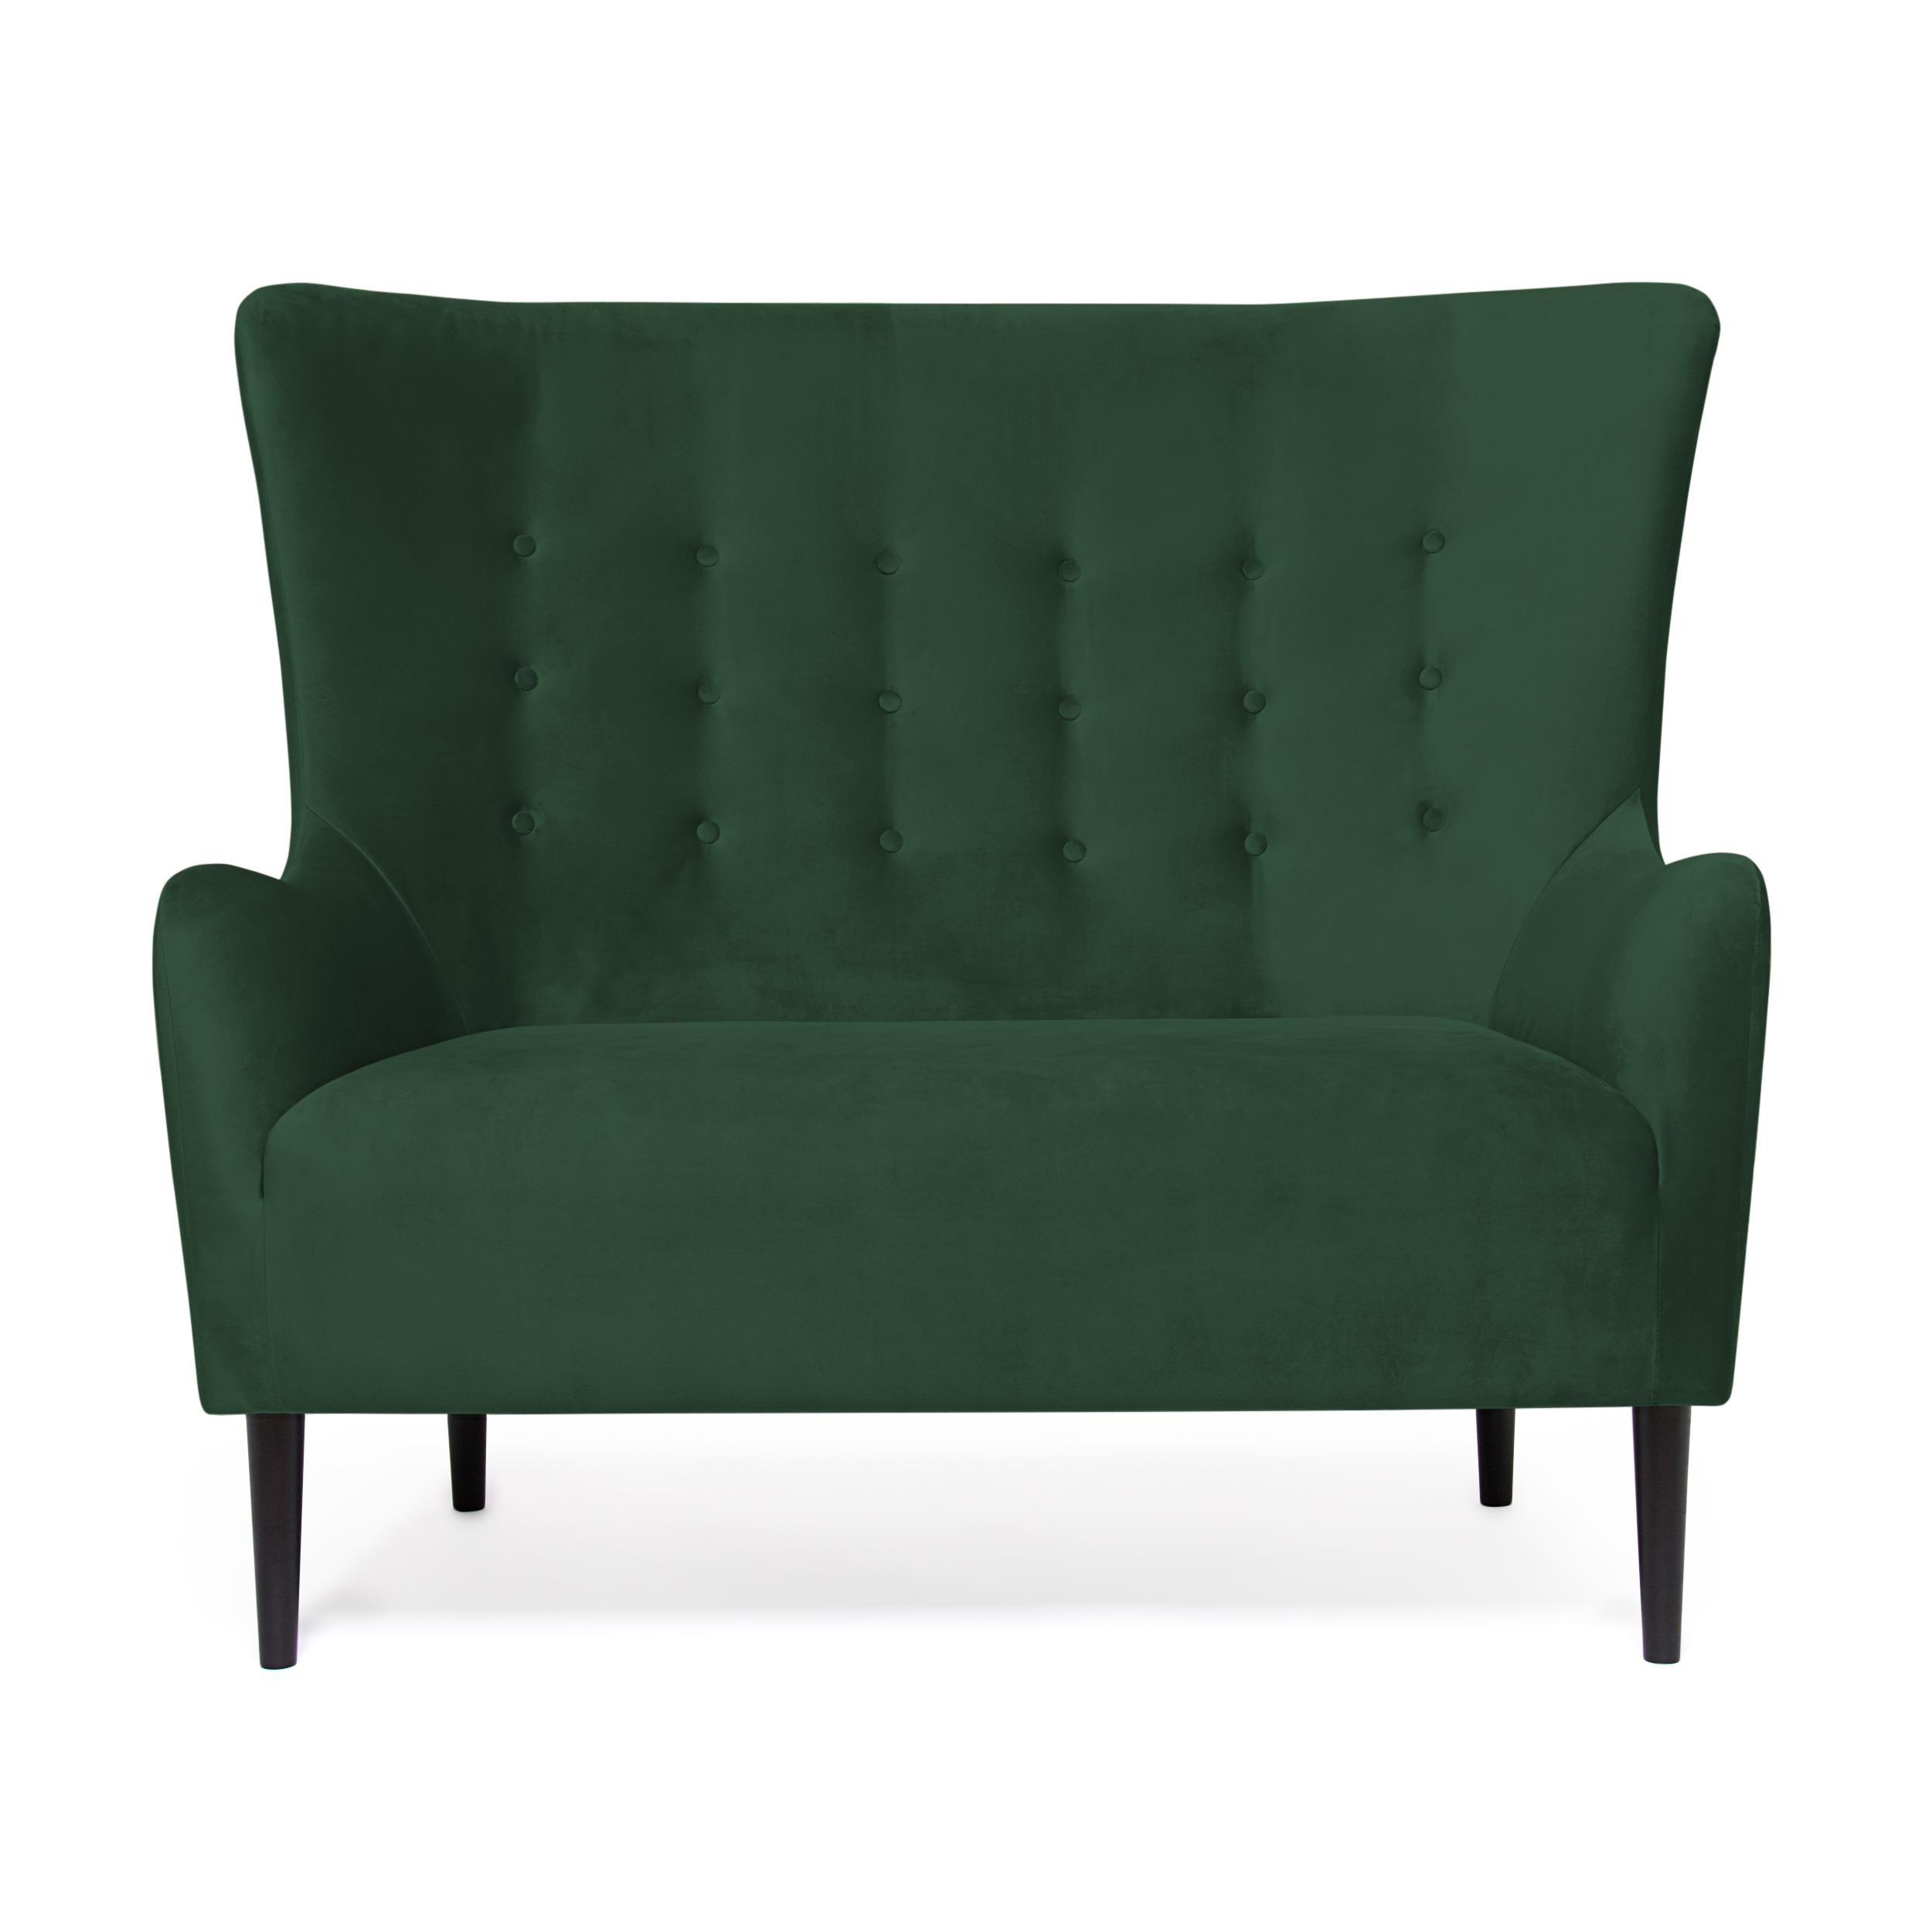 Canapea Fixa 2 locuri Blair Emerald Green